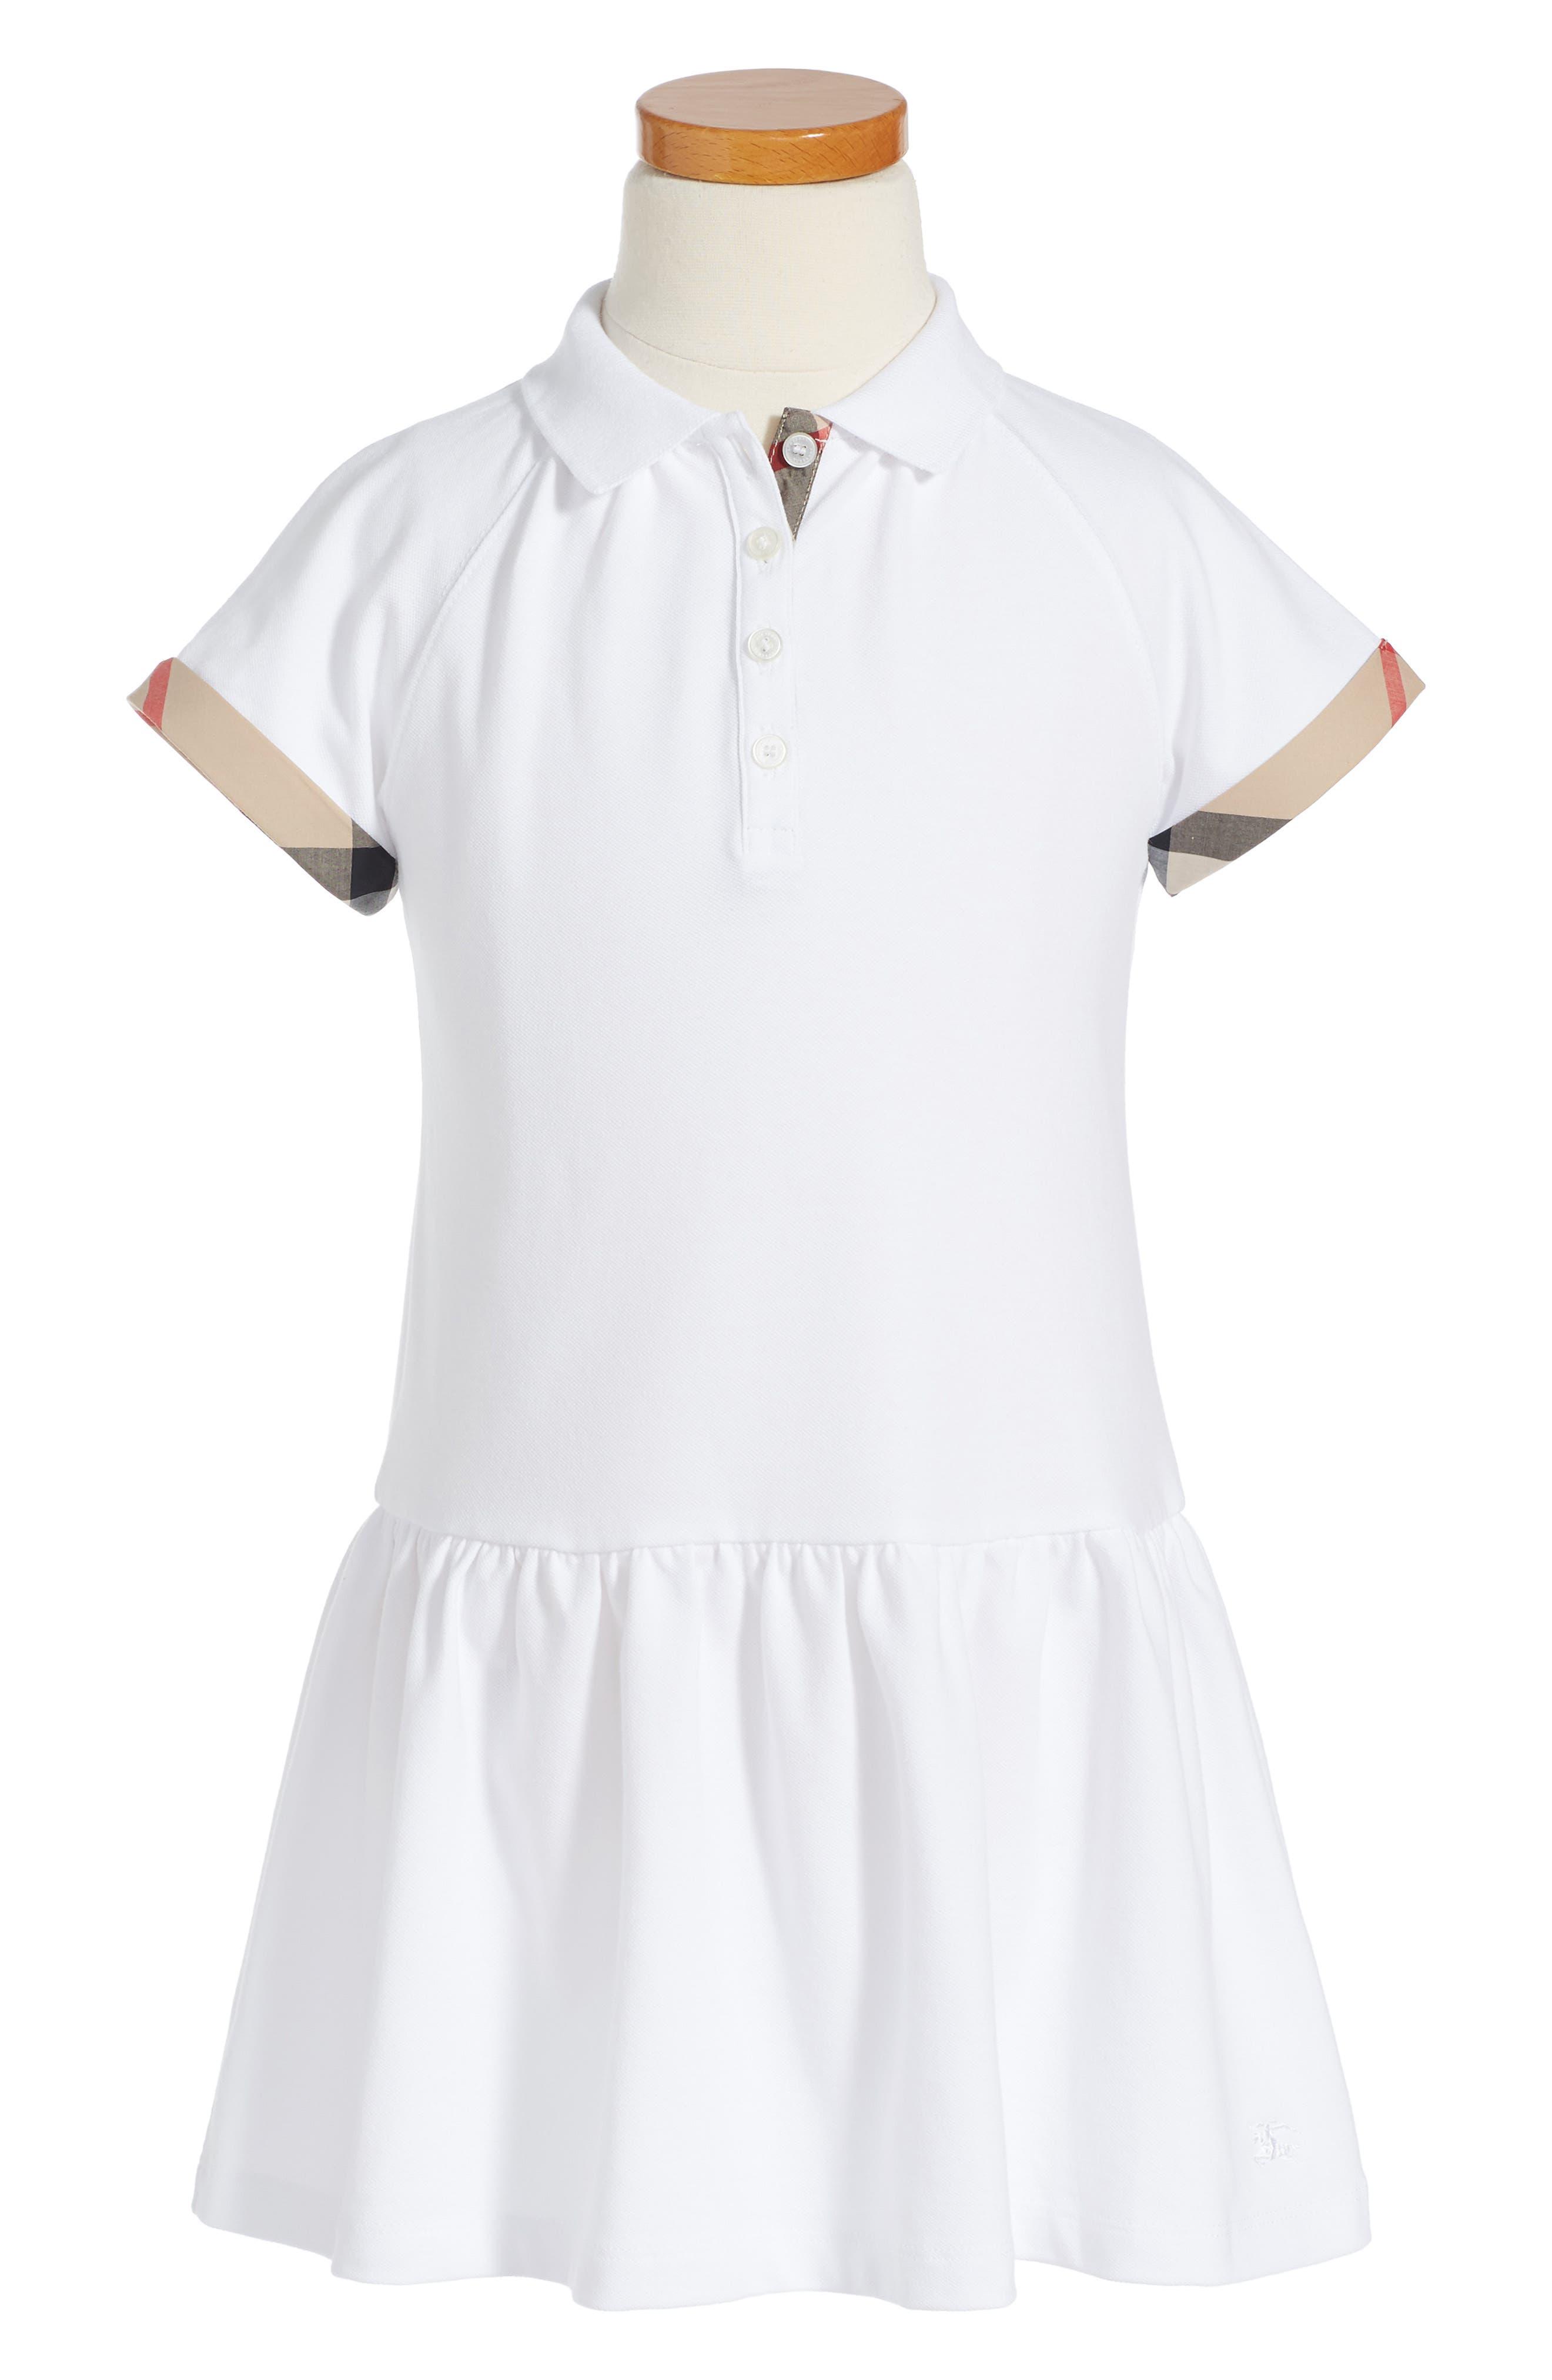 Cali Dress,                         Main,                         color, White